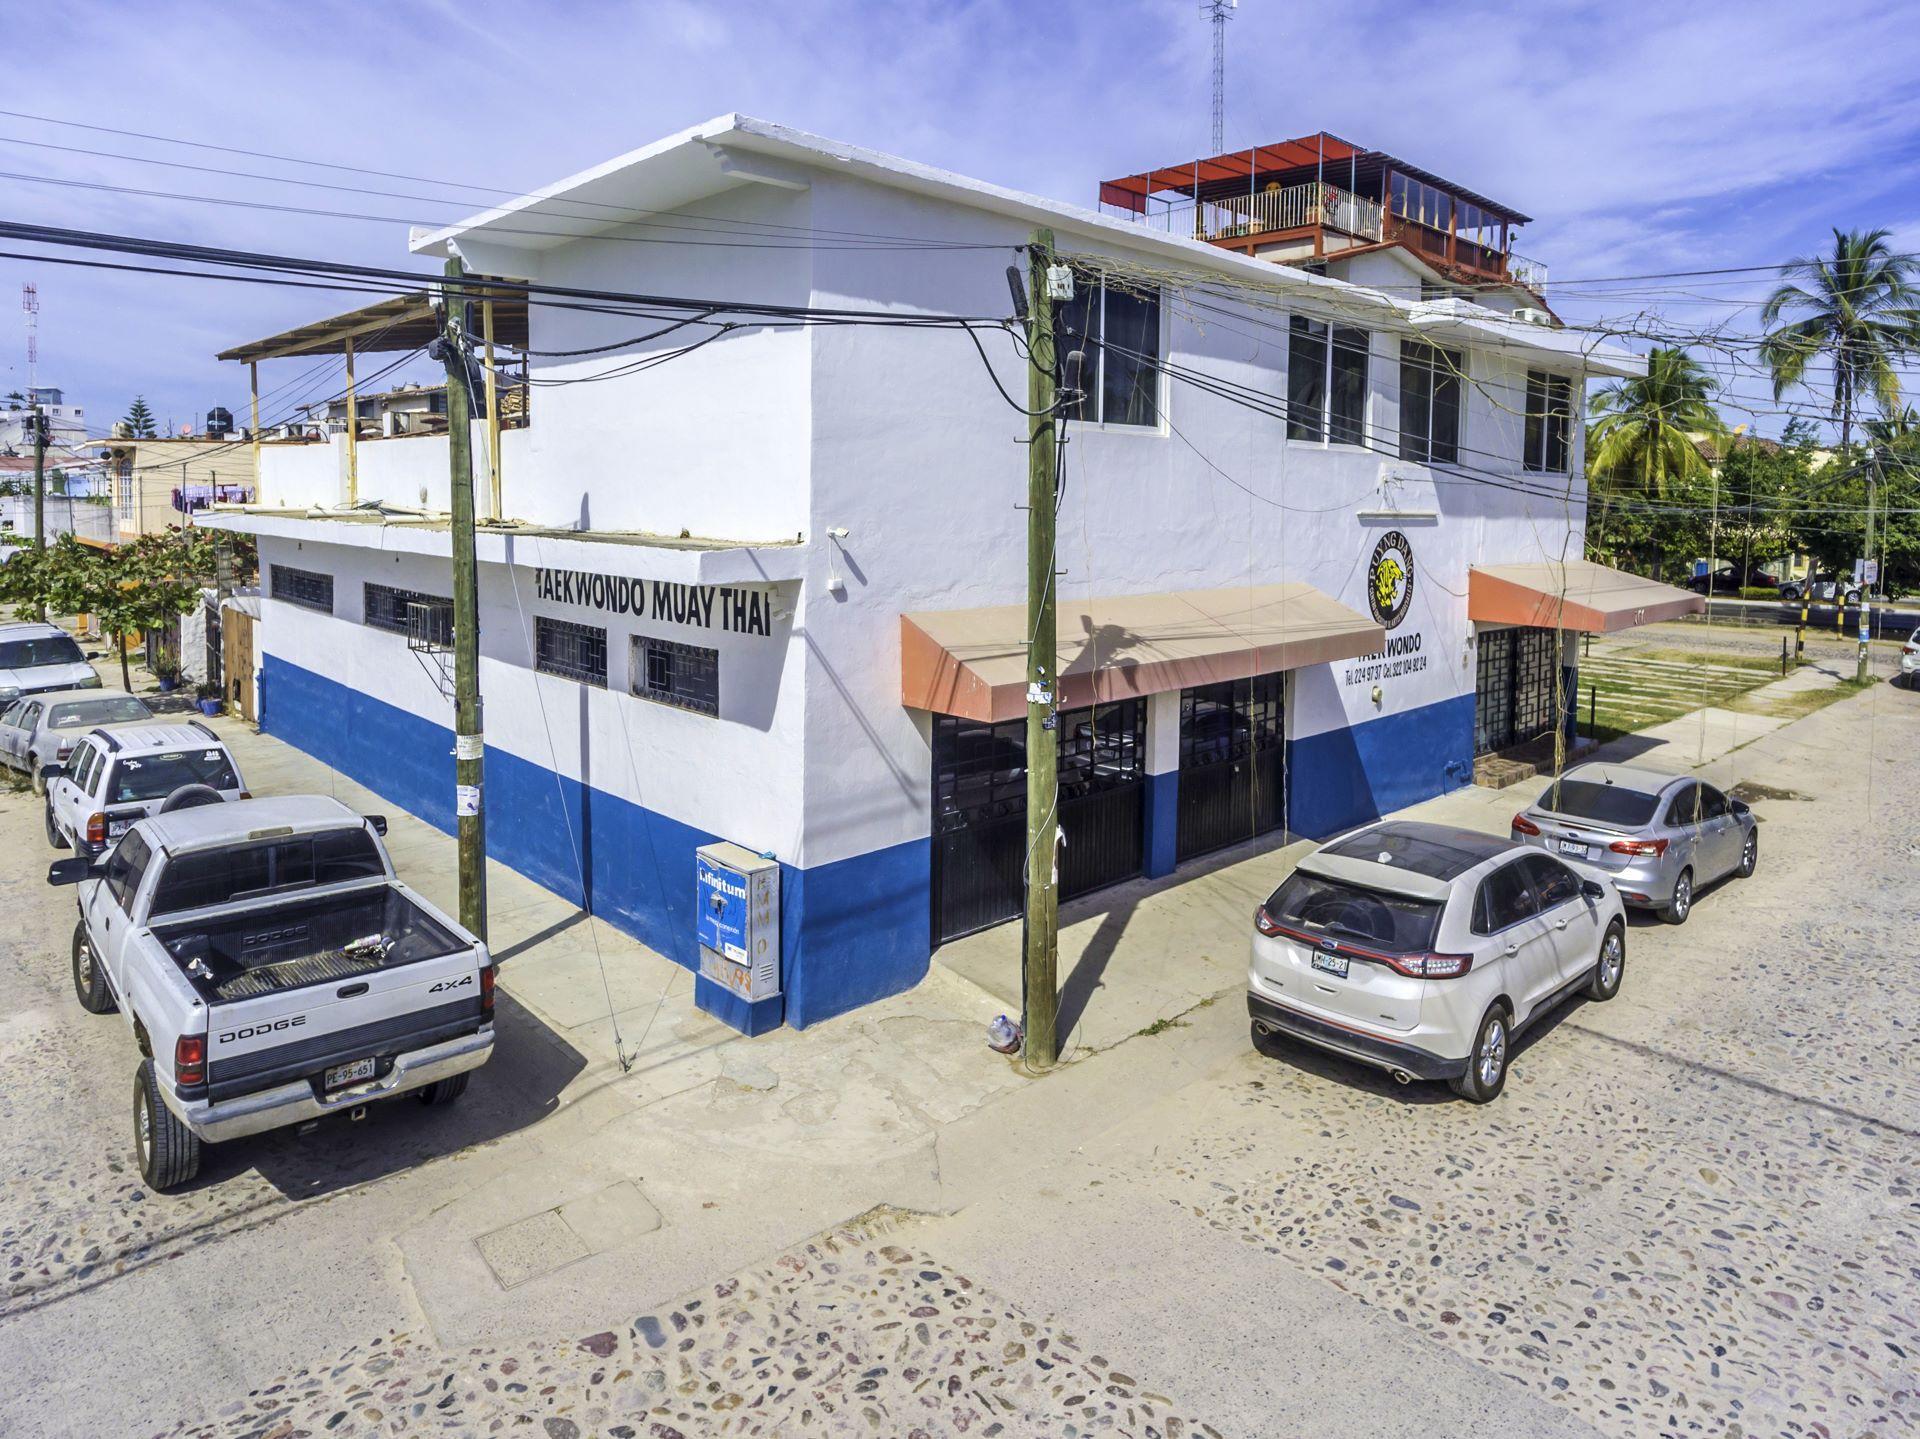 Building Palmar de Aramara